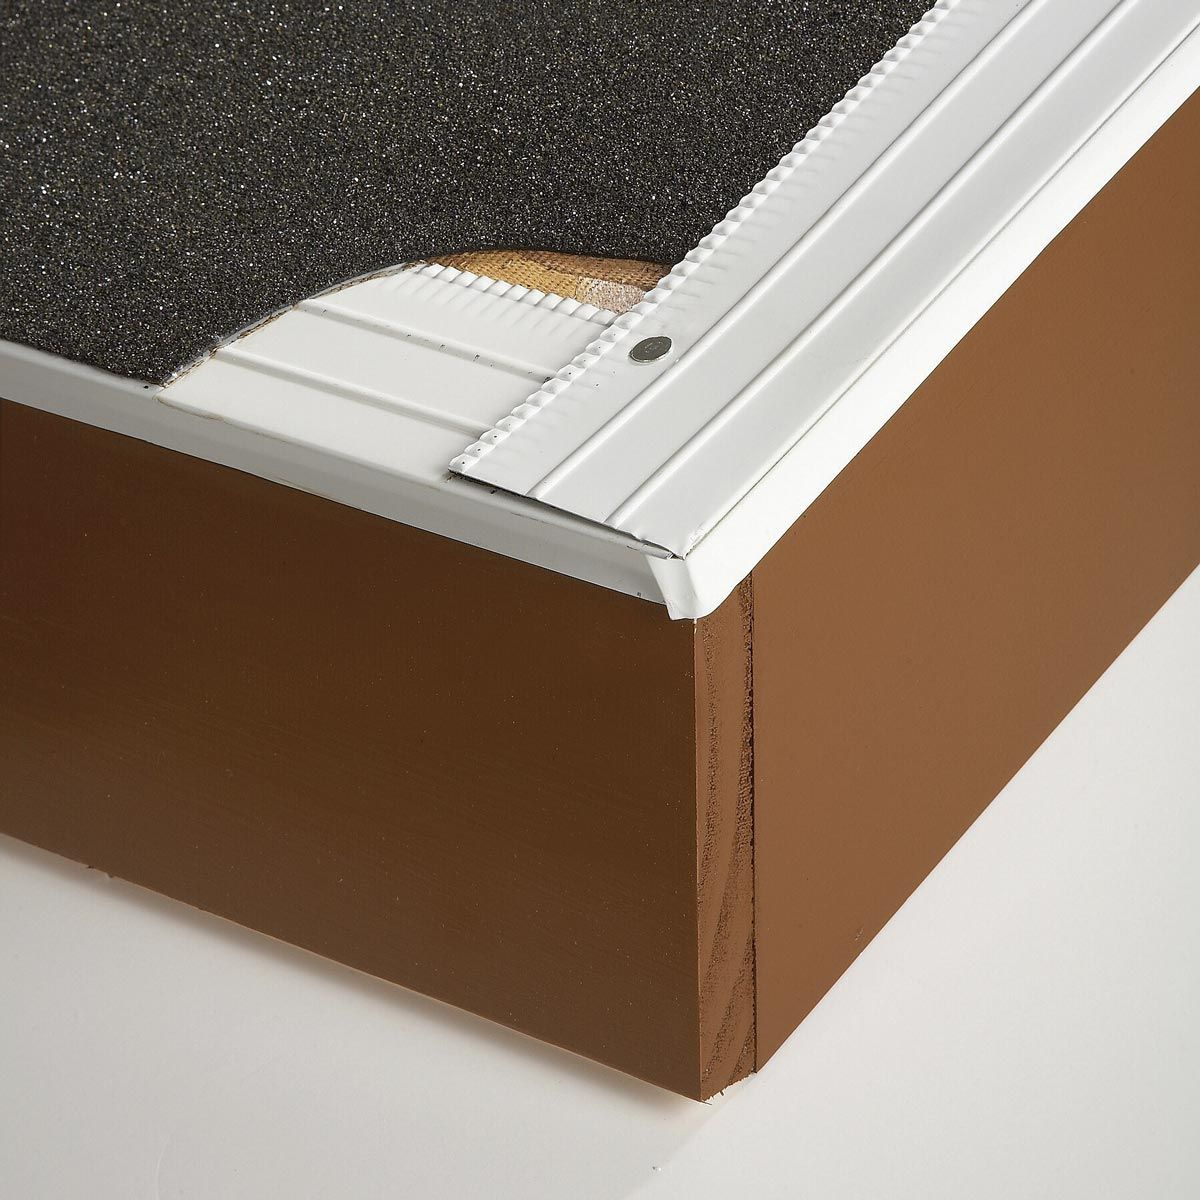 How To Fix A Roof Drip Edge Roof Drip Edge Drip Edge Roof Edge